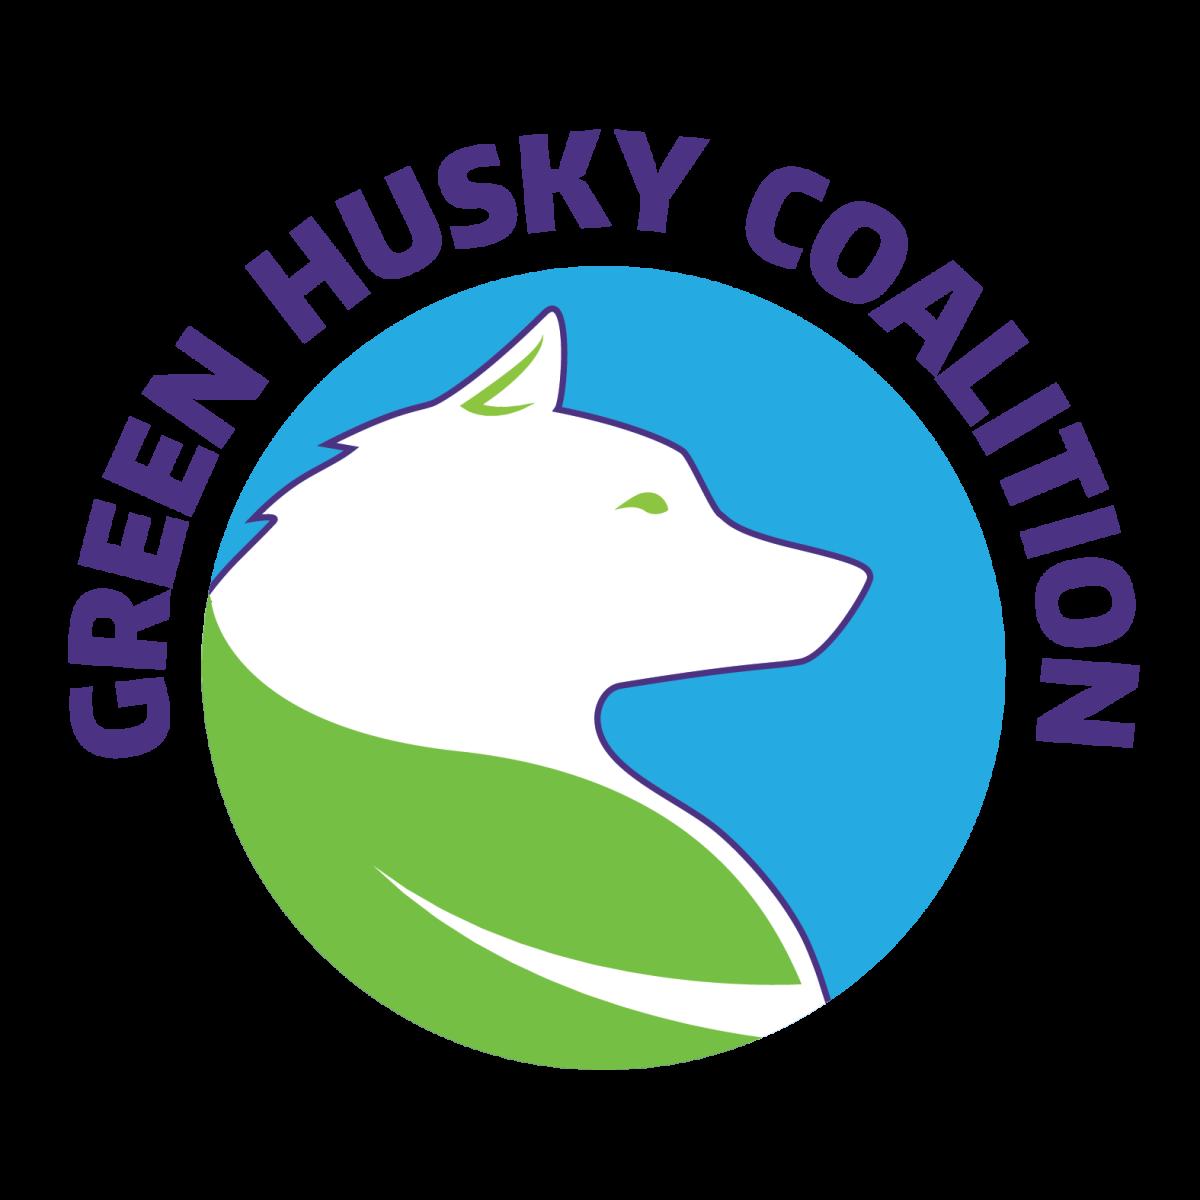 Husky clipart washington university. Green coalition uw sustainability